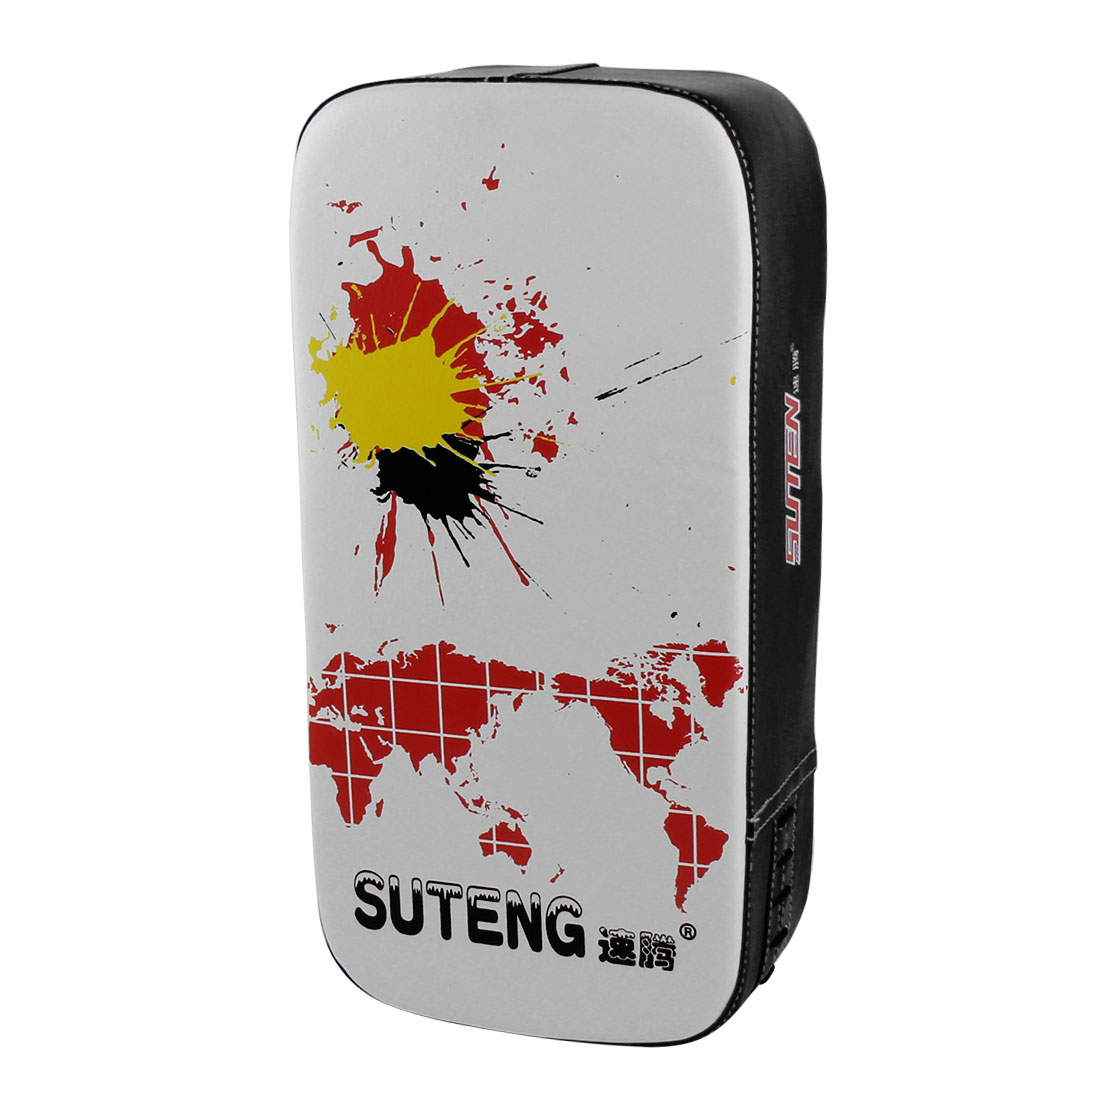 SUTENG Authorized Boxing Punching Kicking Taekwondo Training Pad Shield Black2